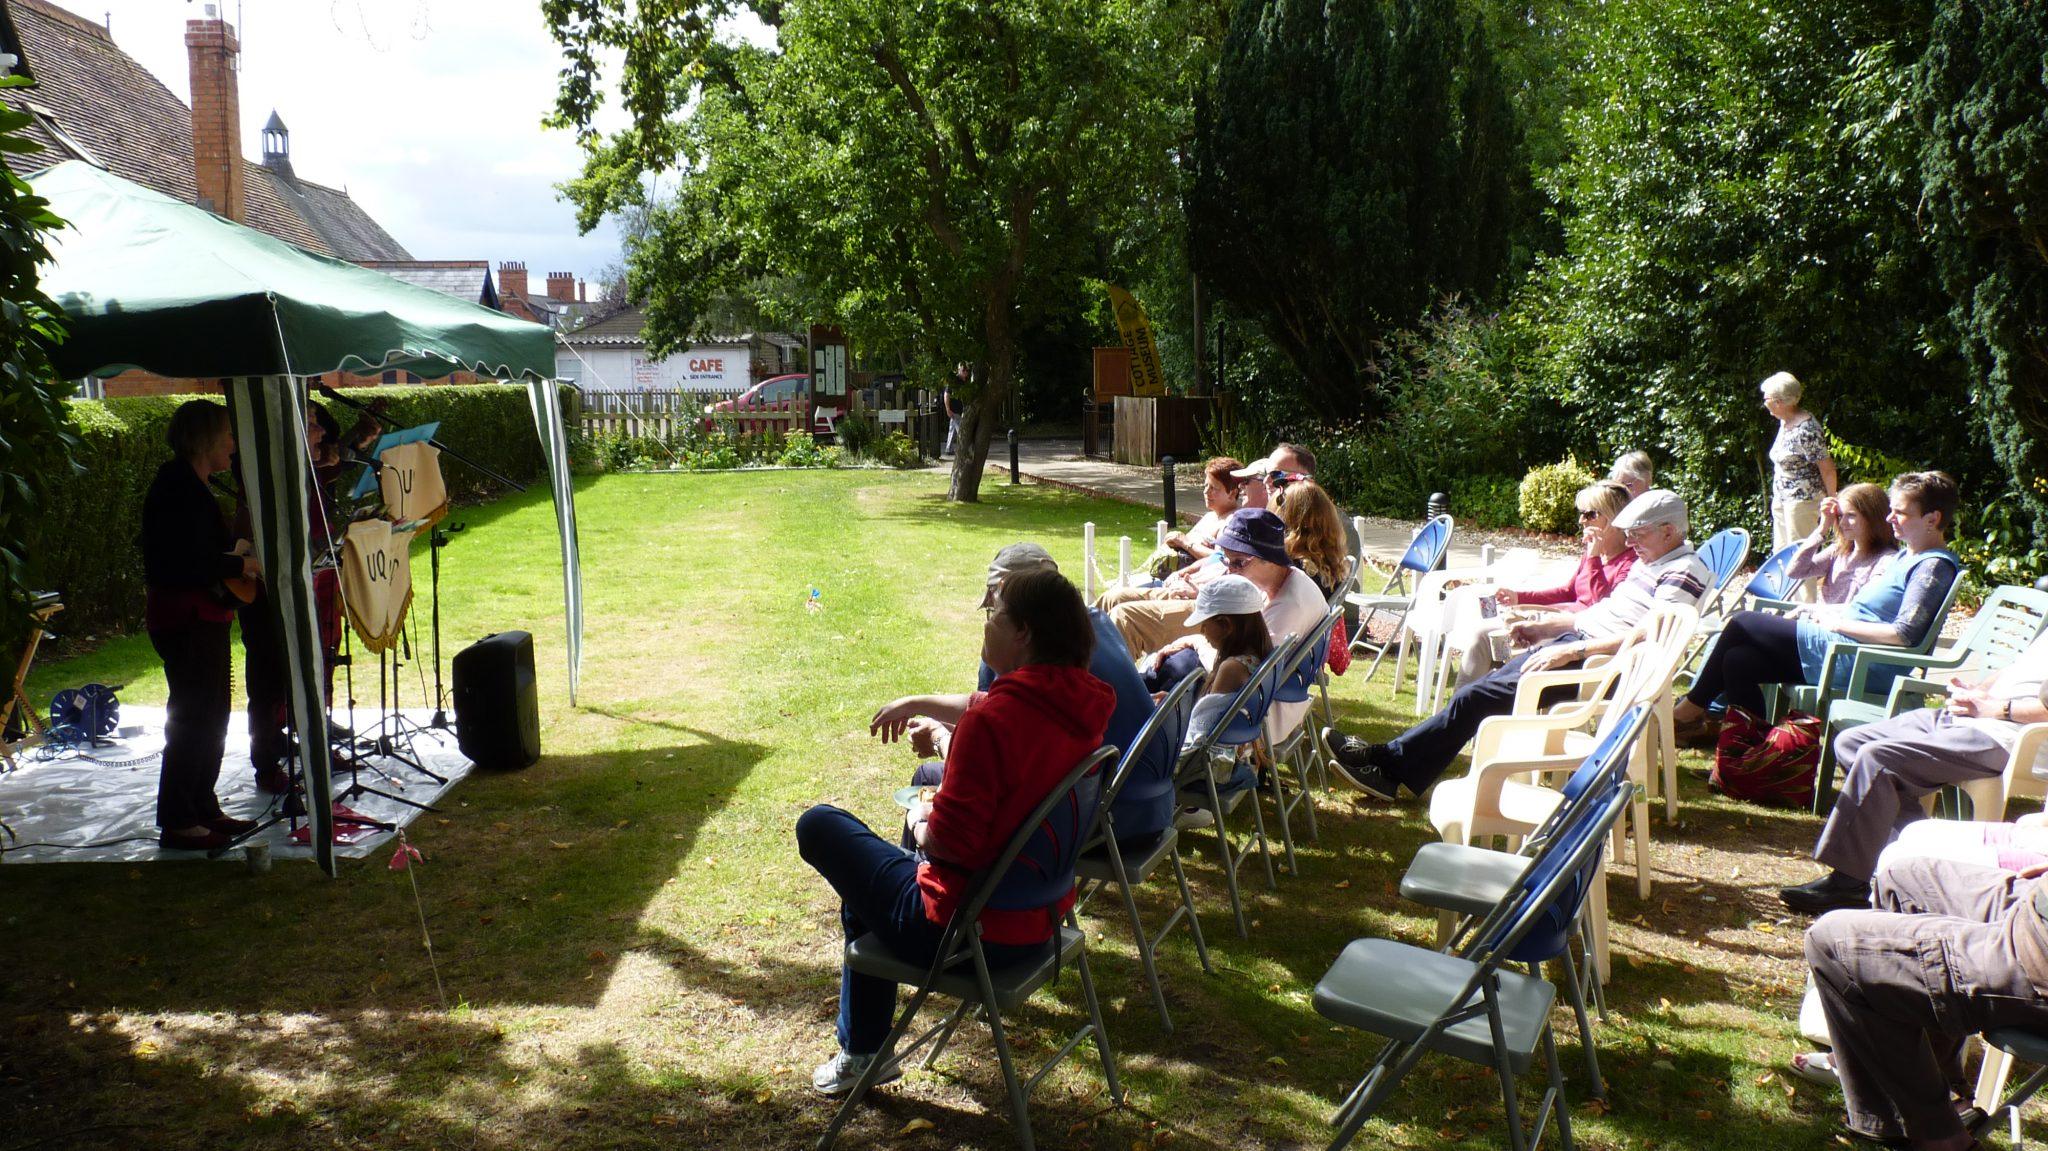 Visitors enjoying the sunshine and music.